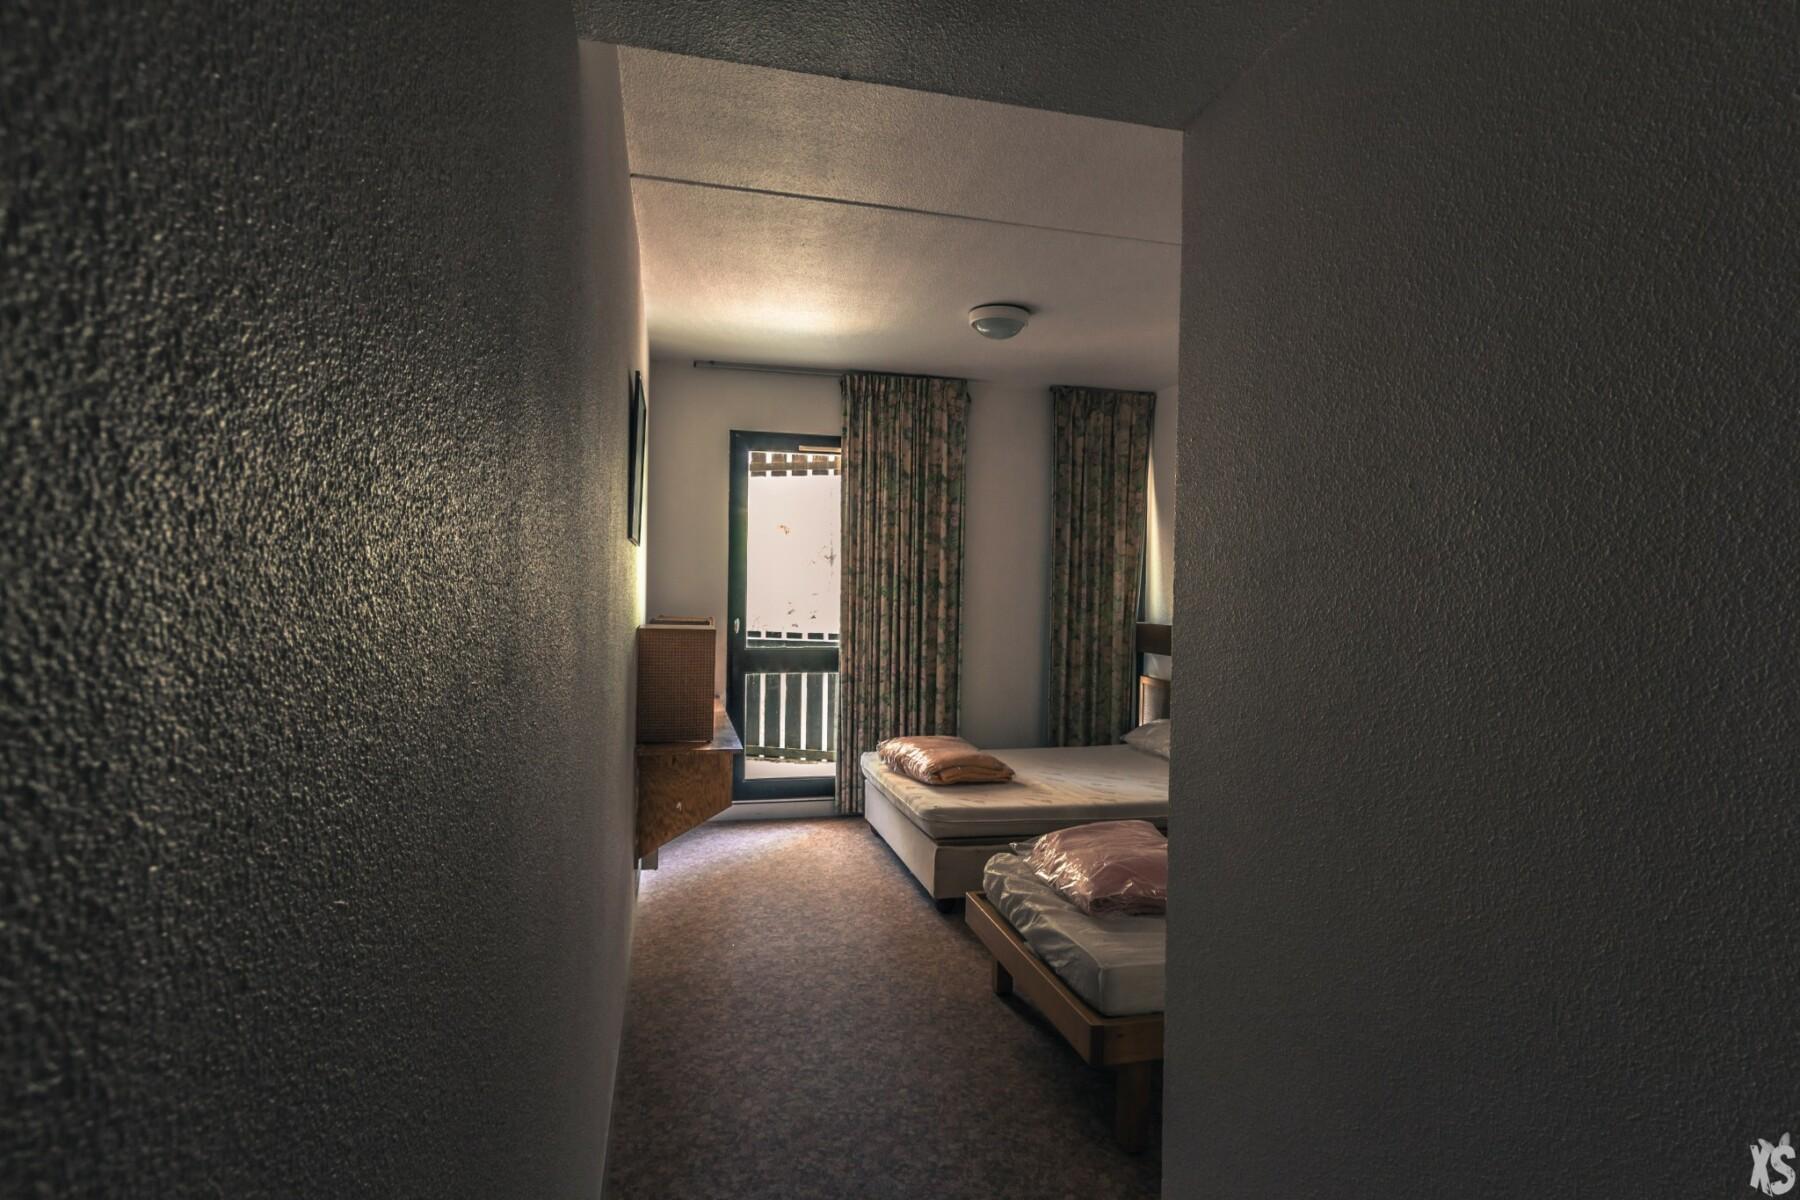 hotel-fryberg-17